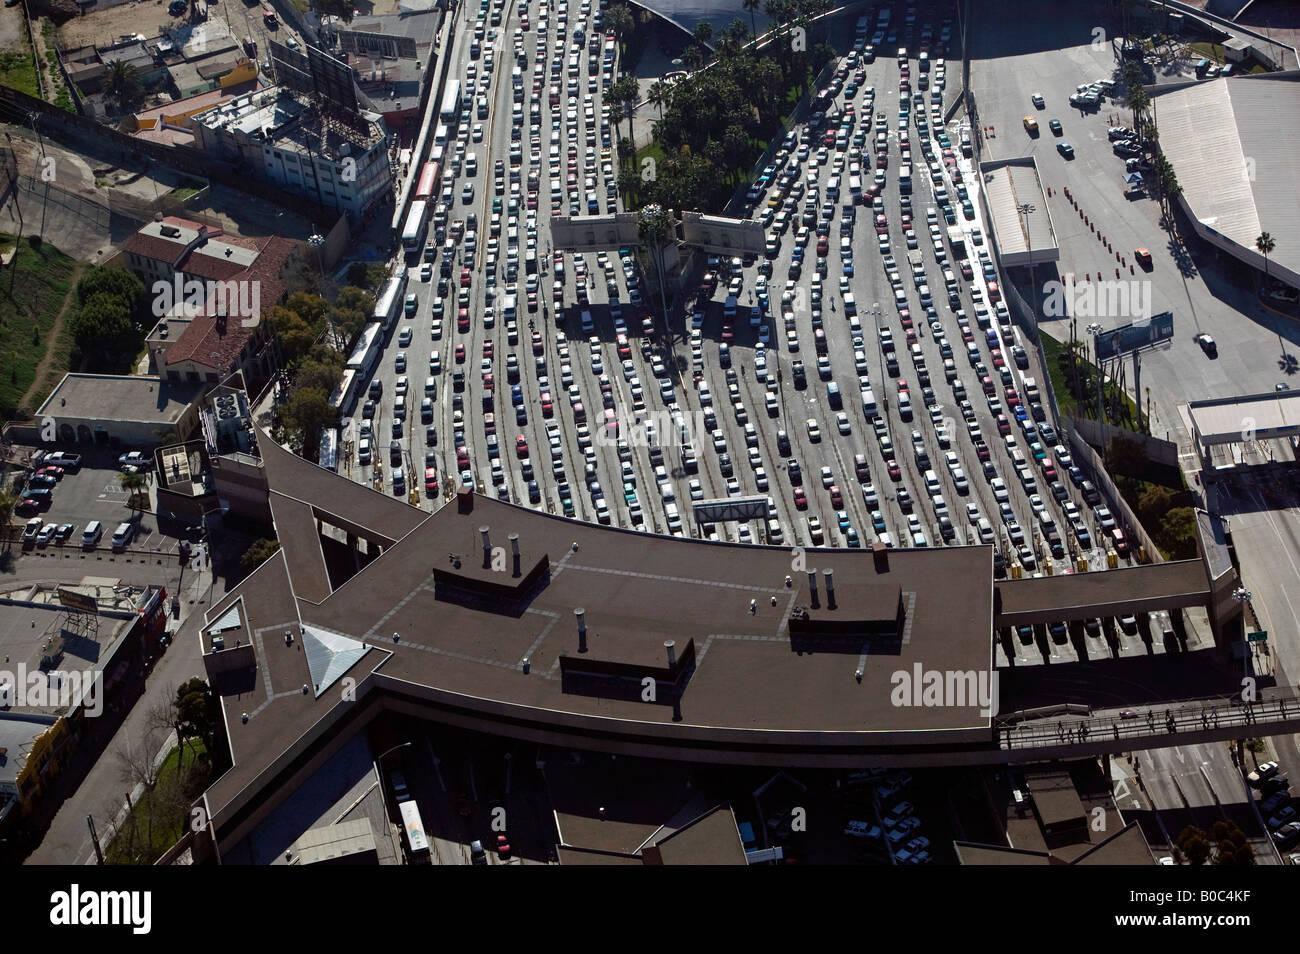 aerial San Ysidro, San Diego, Tijuana border crossing at the  Mexican American border - Stock Image